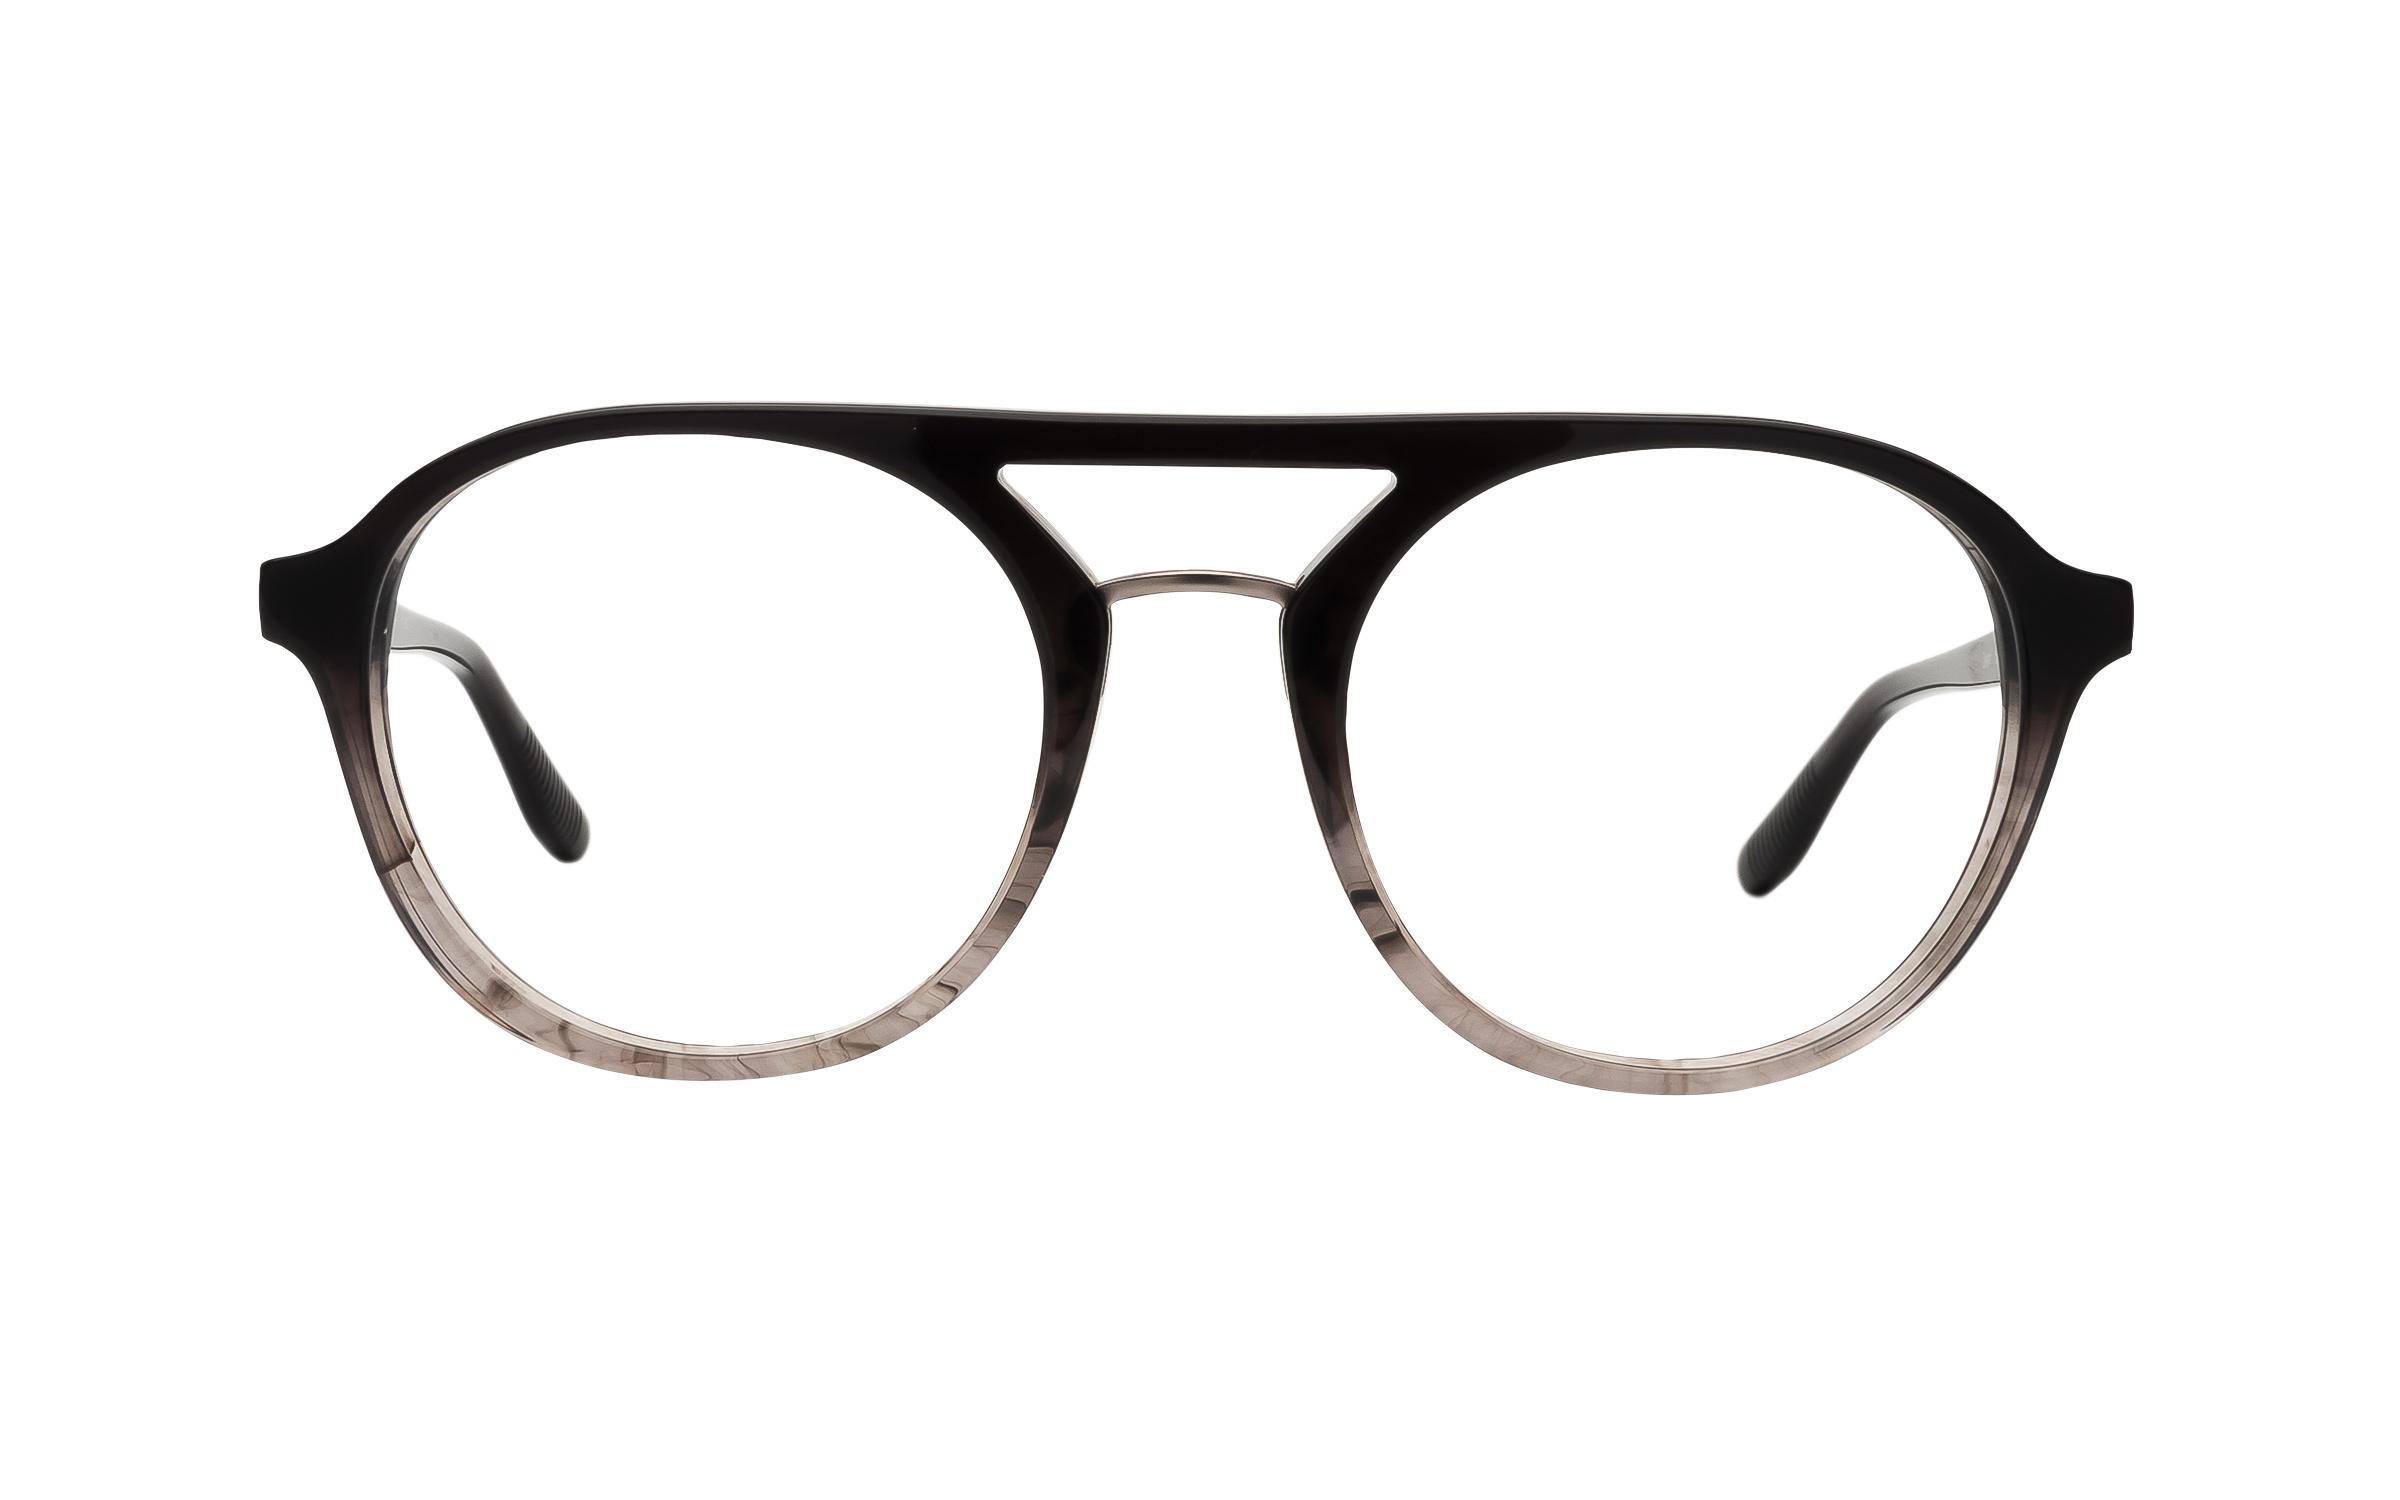 Men's Black, Grey Vintage Joseph Marc Glasses - Clearly Glasses Online